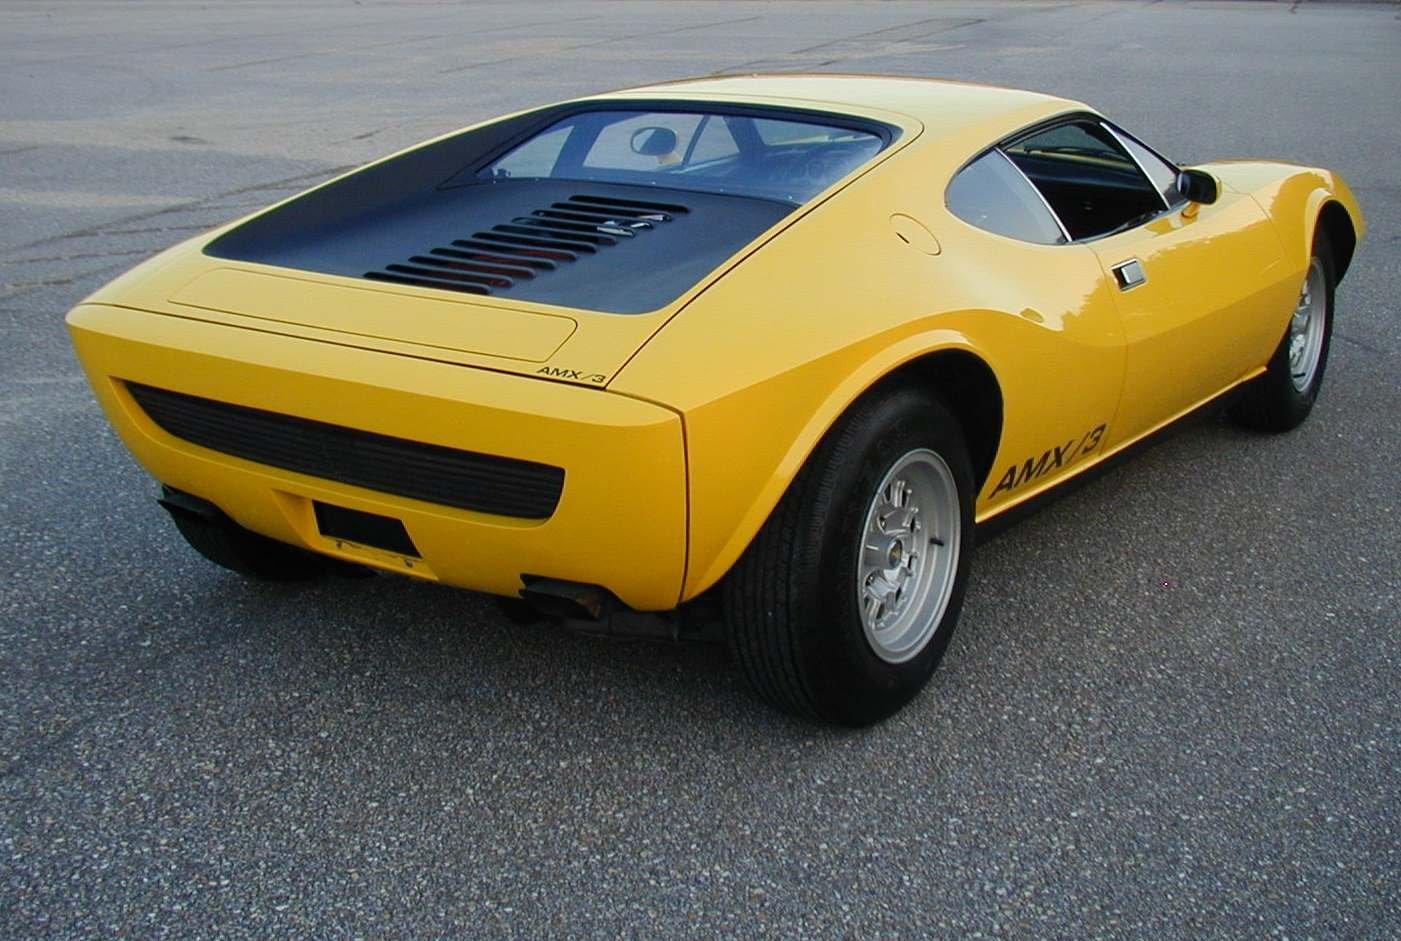 1970 American Motors Amx 3 Vignale Concepts